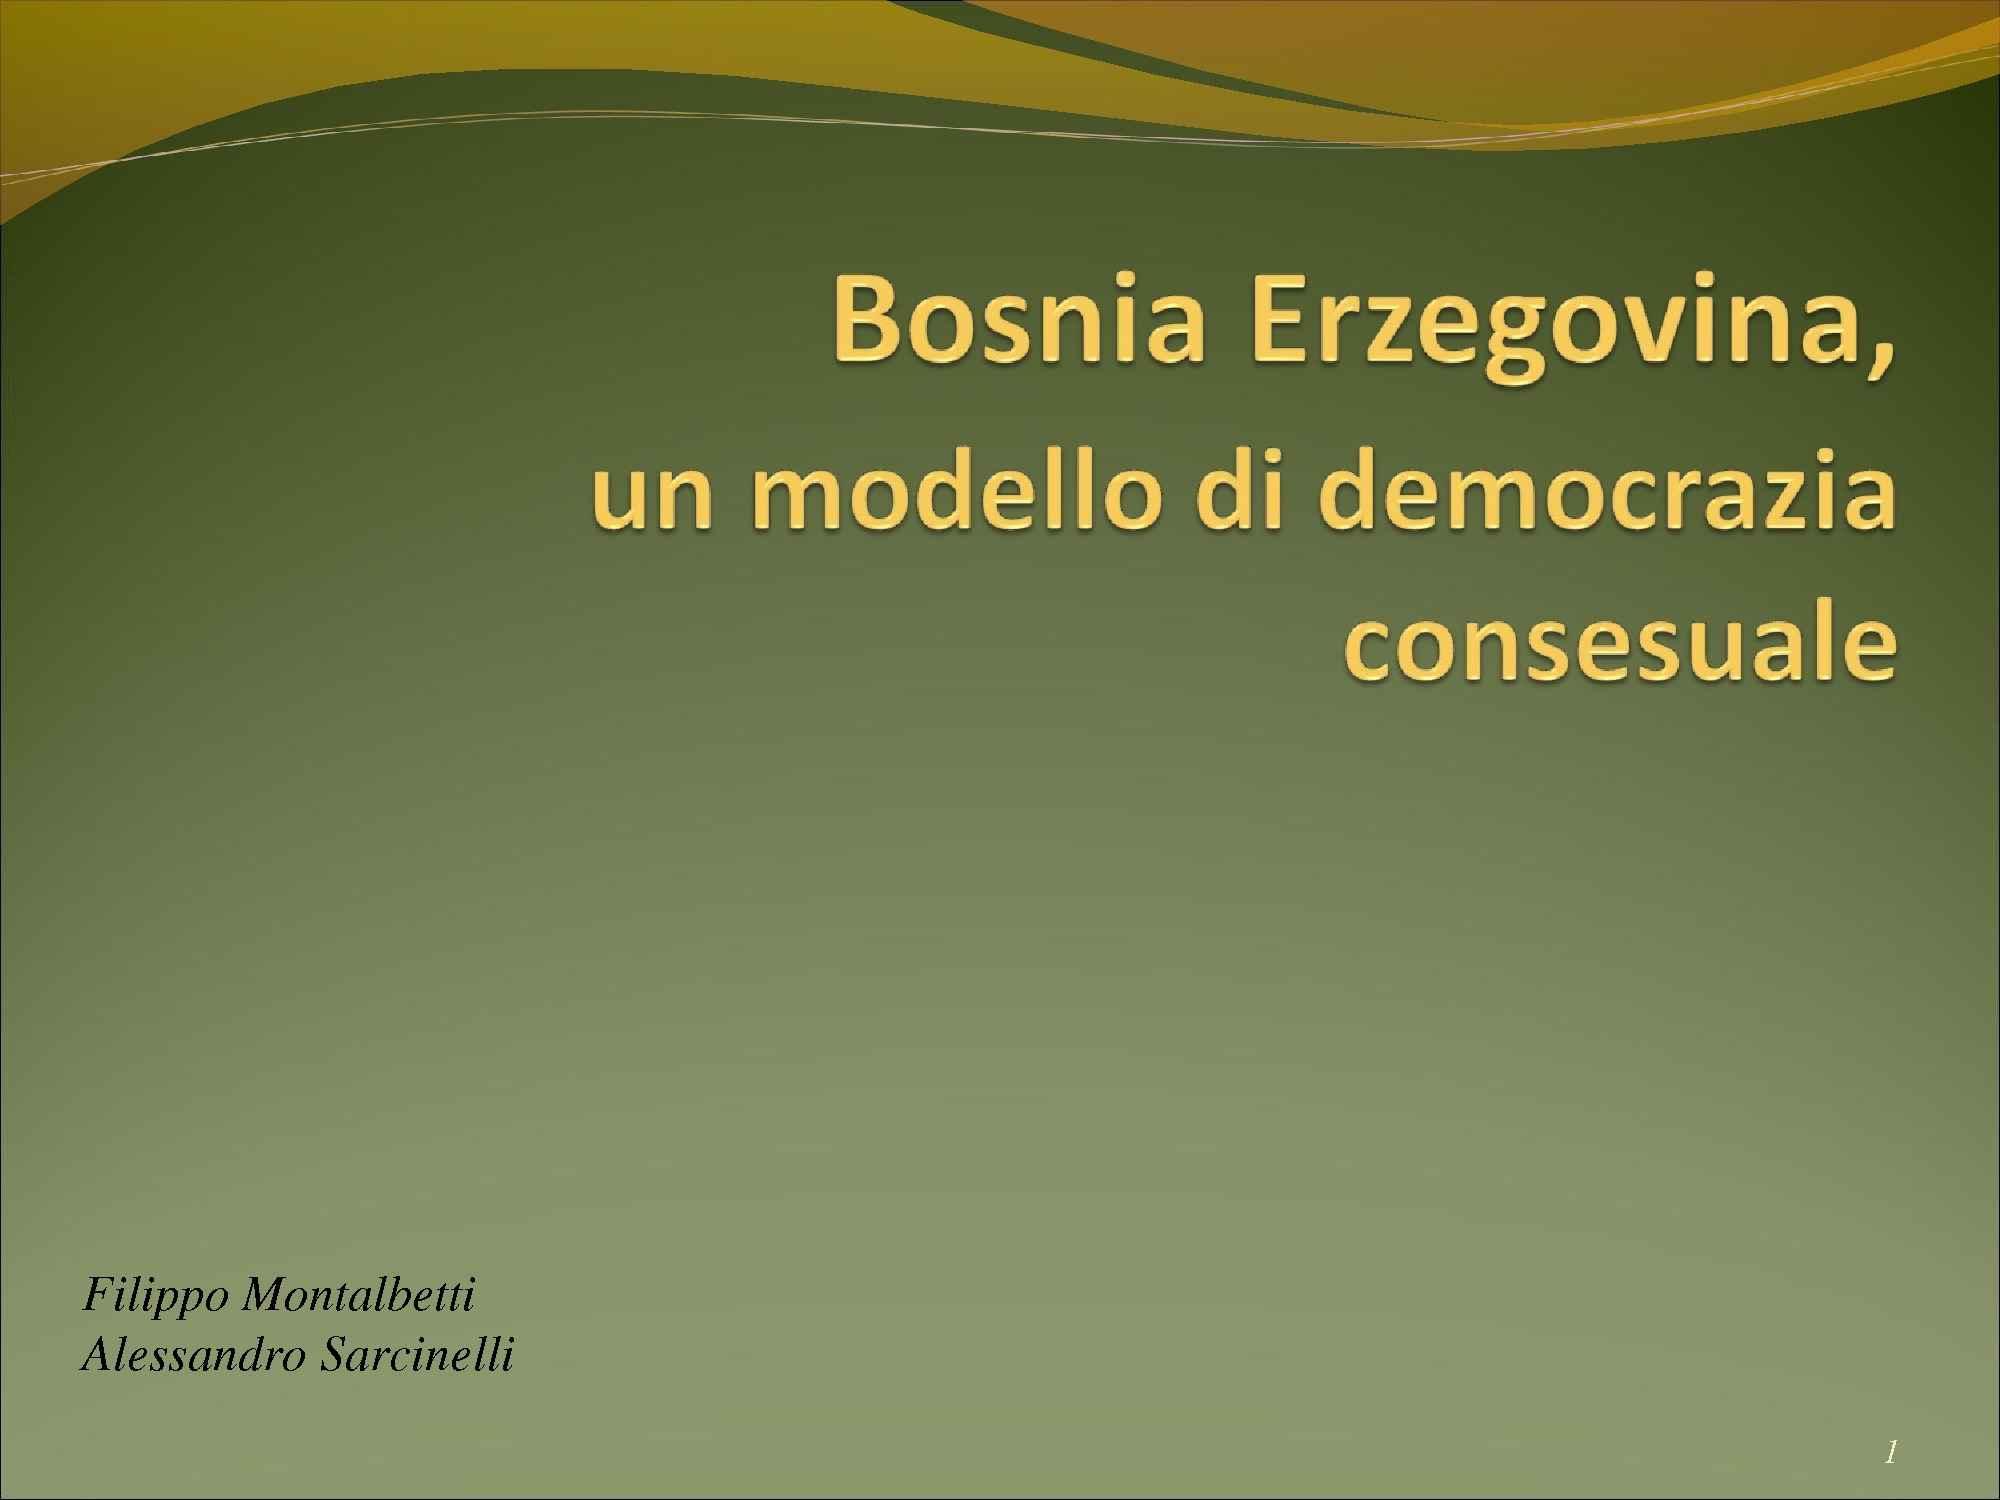 Sistema istituzionale ed elettorale in Bosnia - Erzegovina